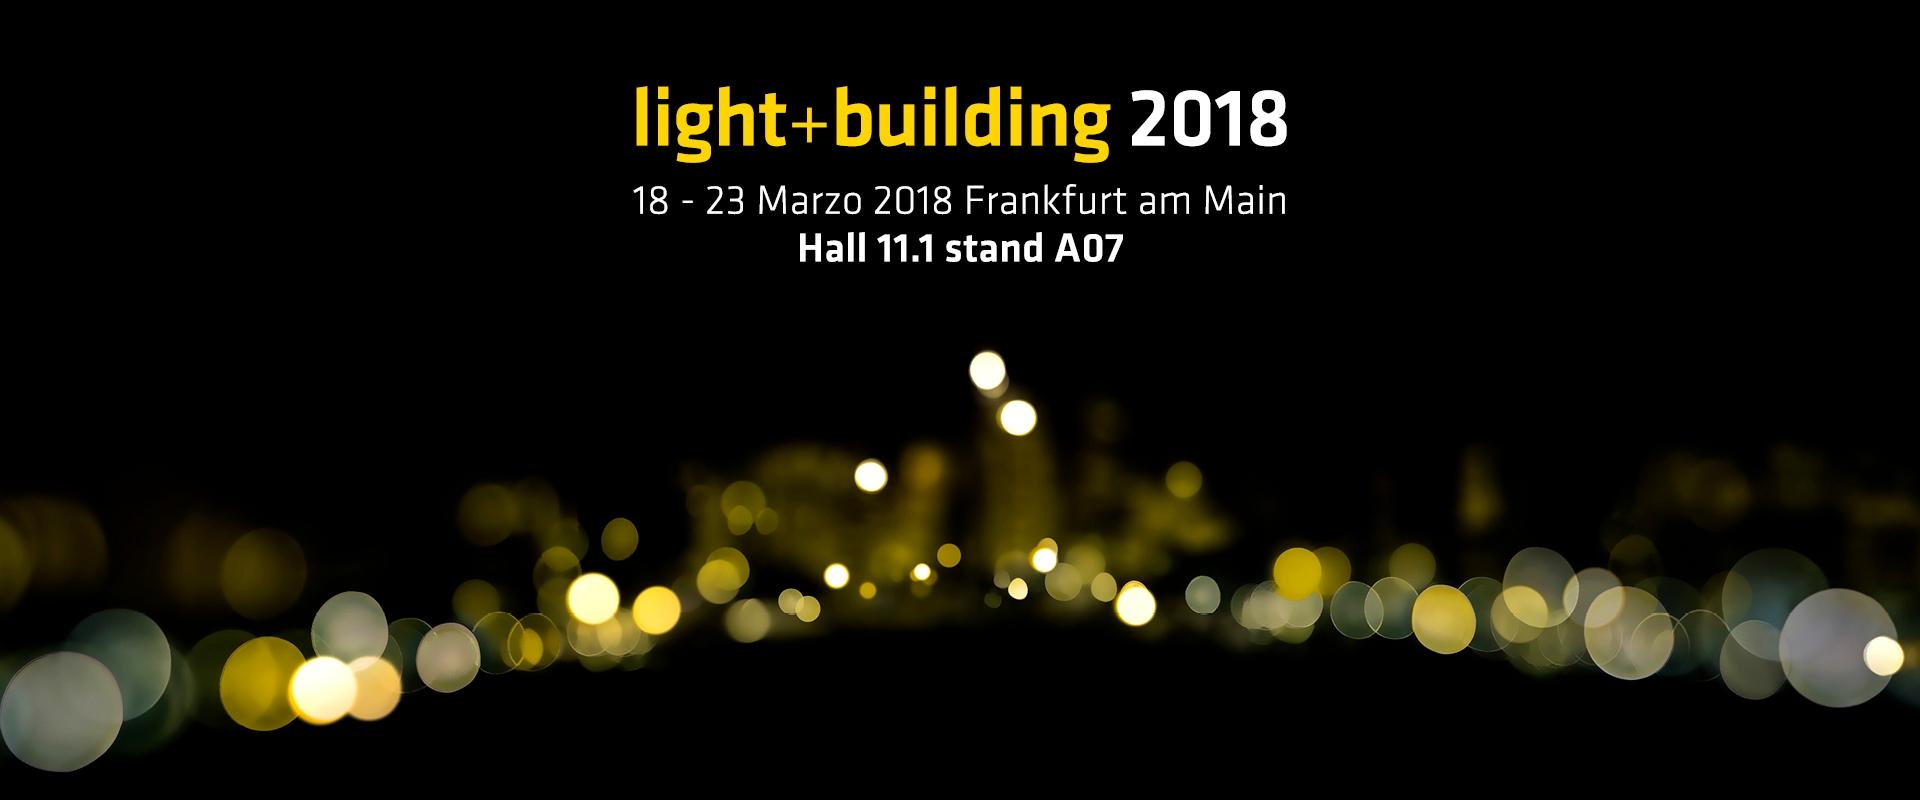 light+building 2018 - Francoforte